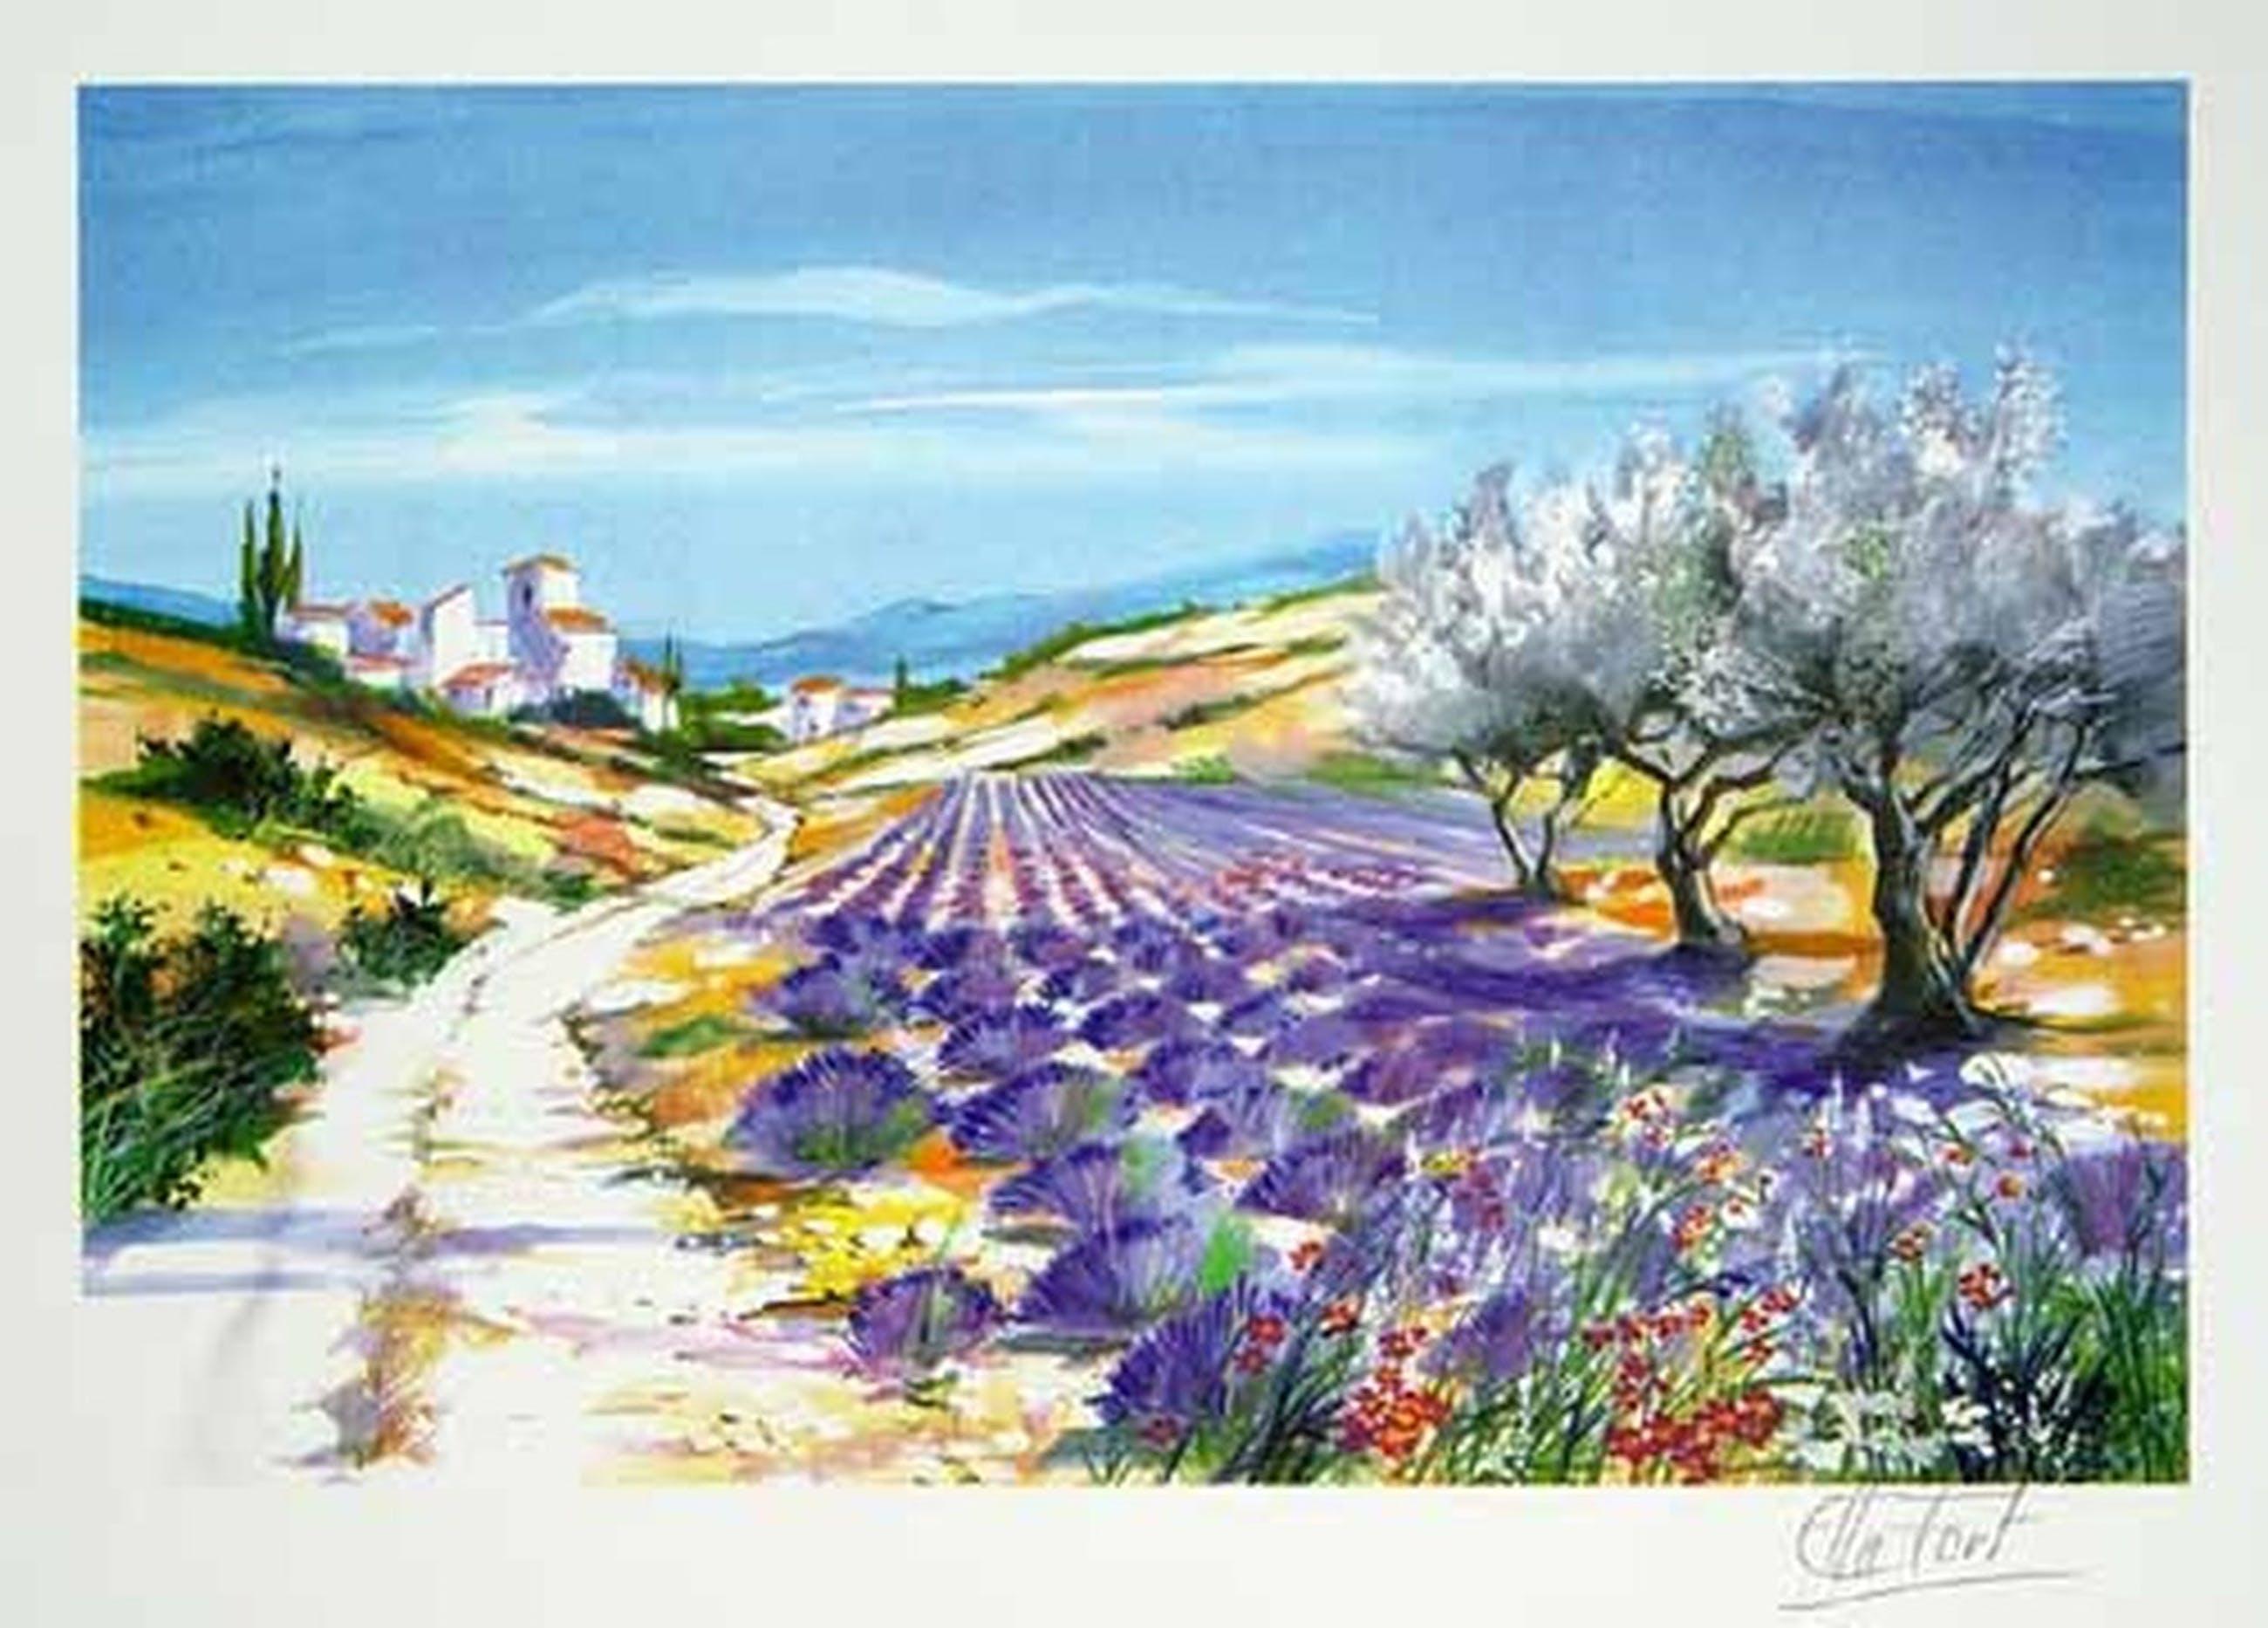 ELLA FORT - Village ae Provence - handgesigneerde litho kopen? Bied vanaf 25!